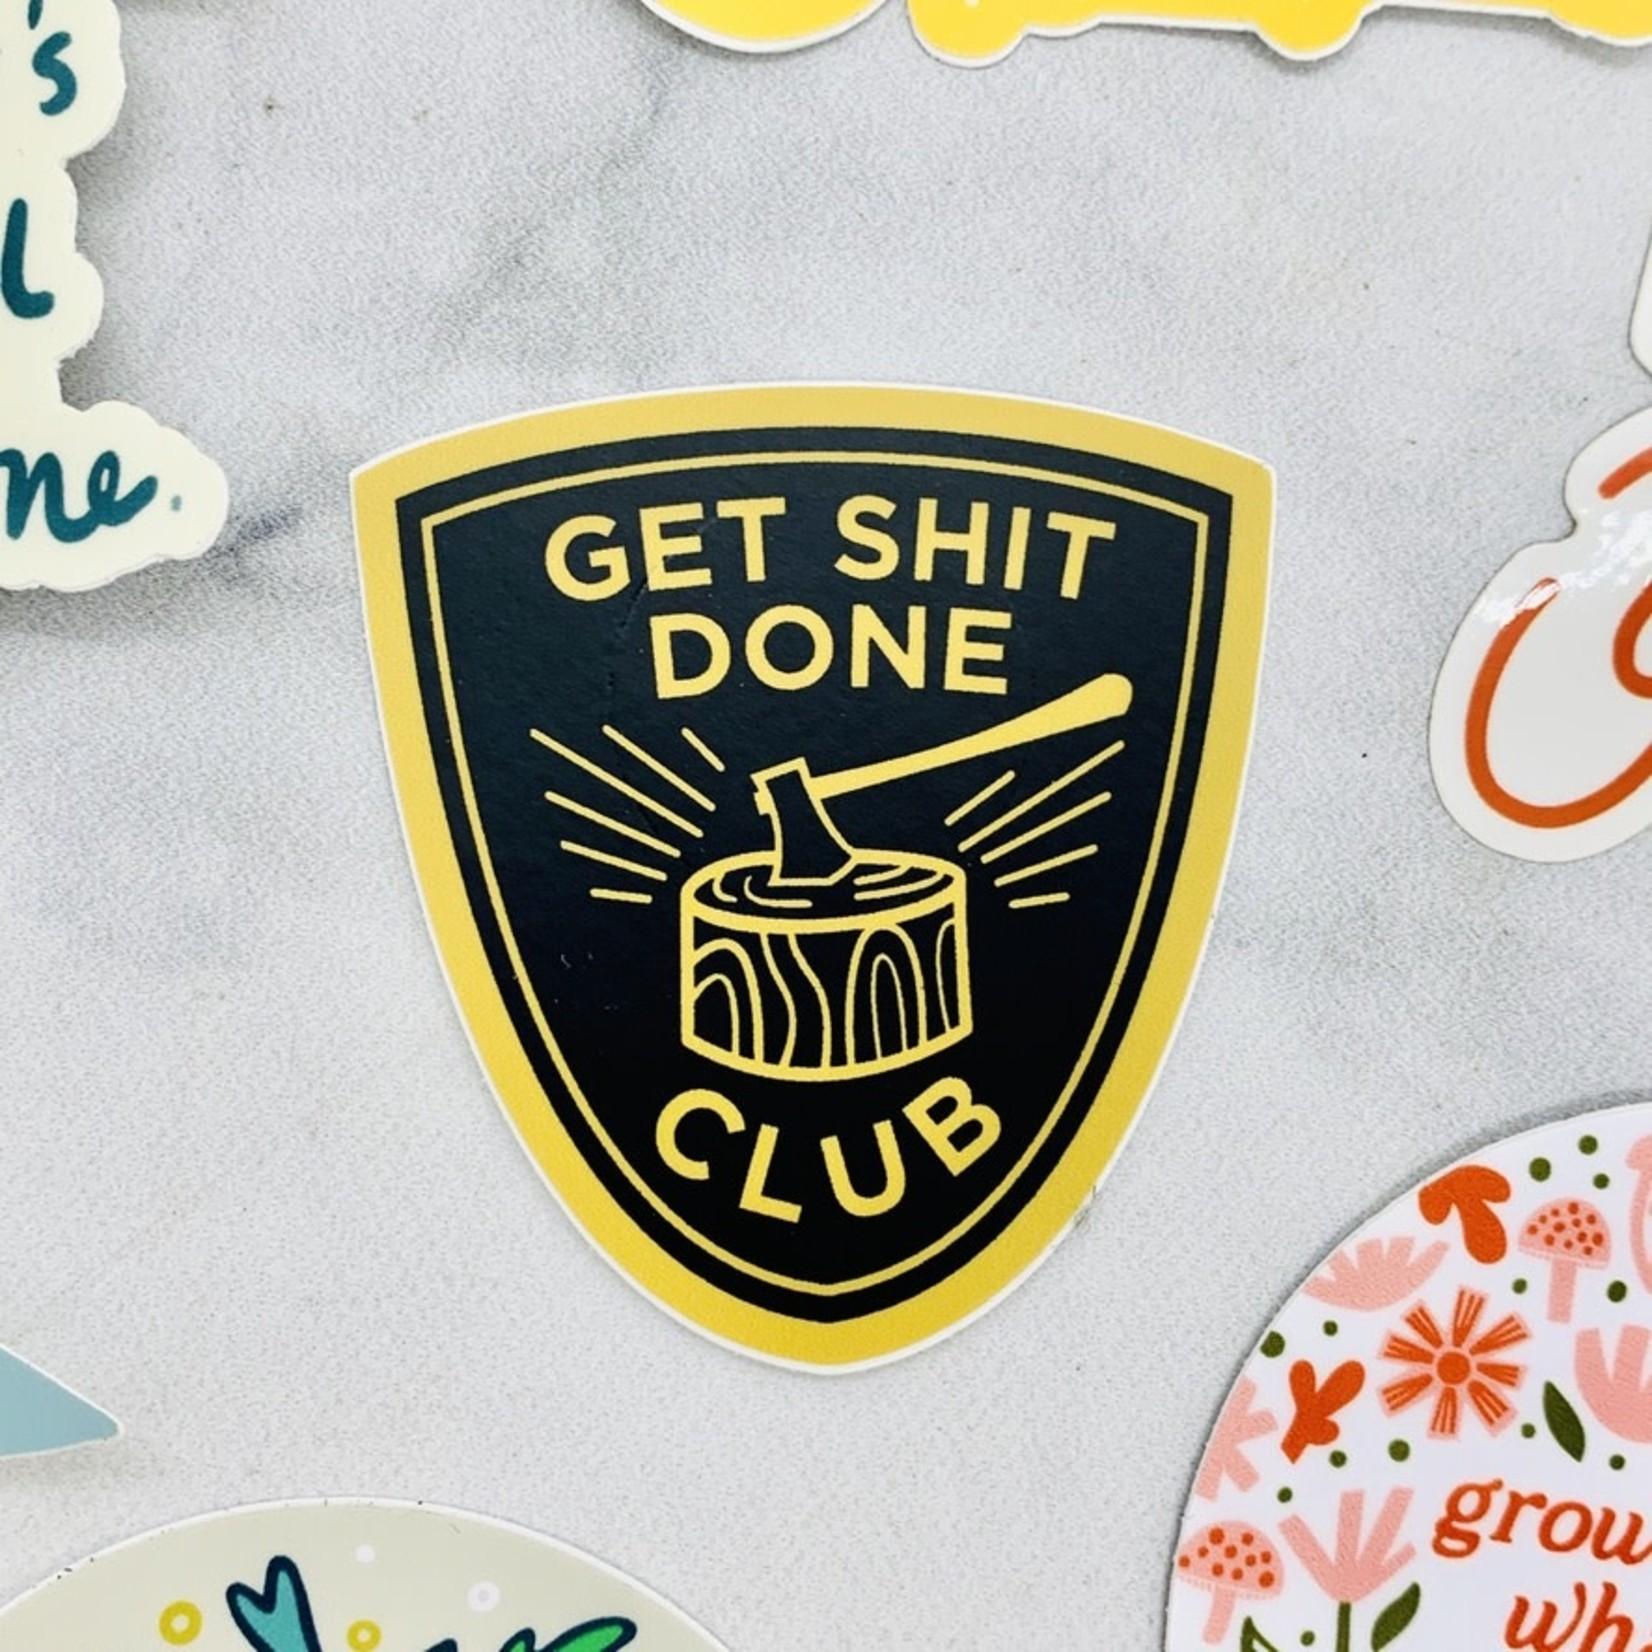 Paper Parasol Press Get Shit Done Club Sticker